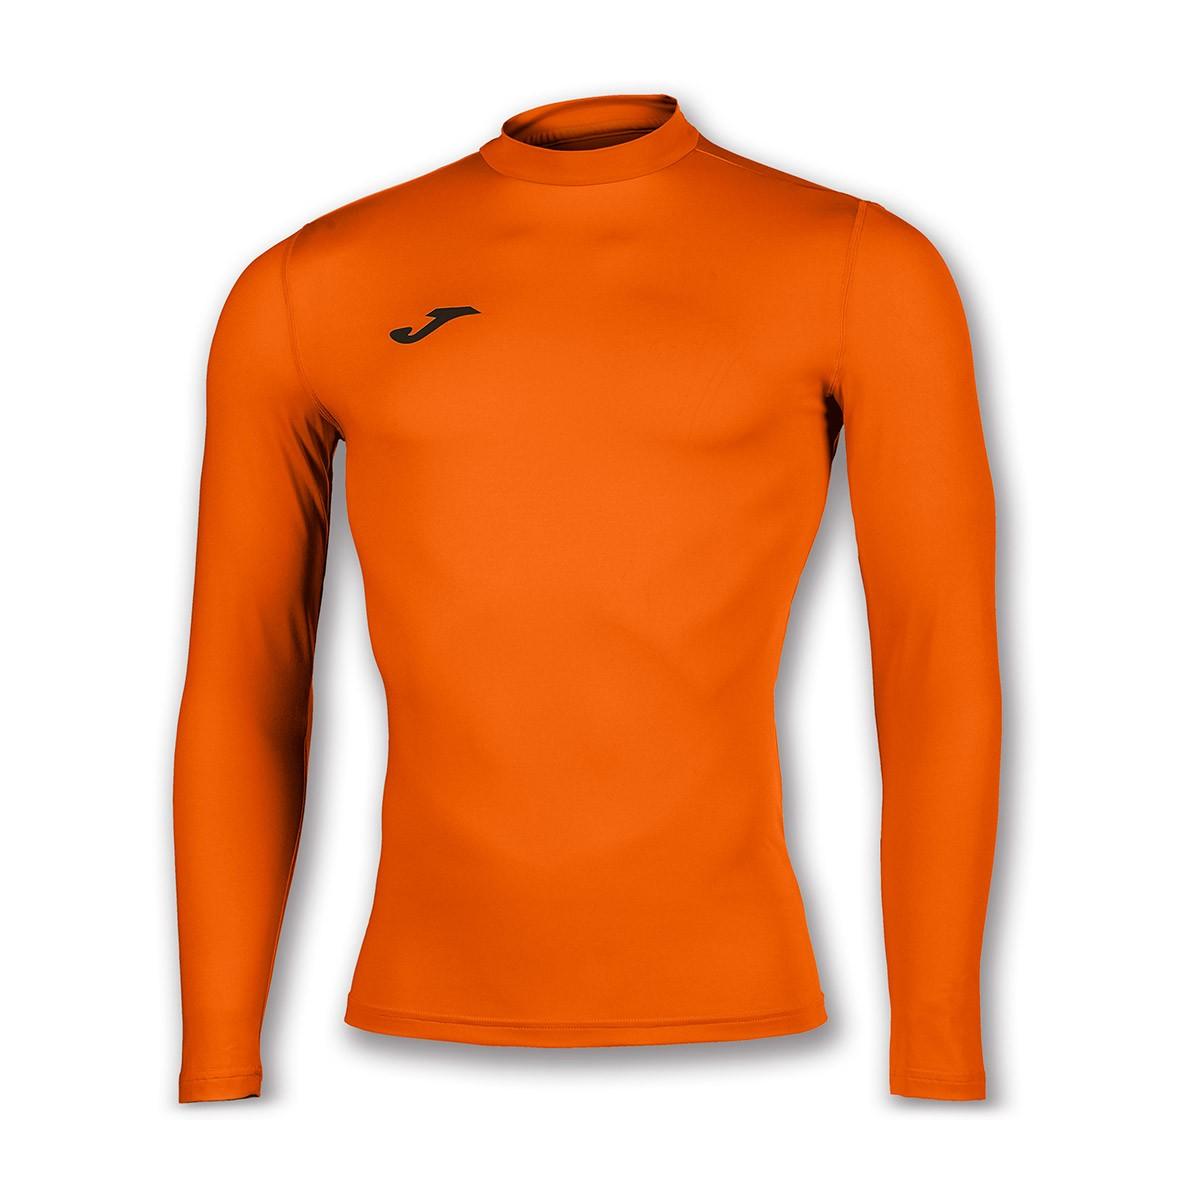 Camiseta Joma Térmica m l Brama Academy Naranja - Soloporteros es ahora  Fútbol Emotion f7d5cd4873dc3